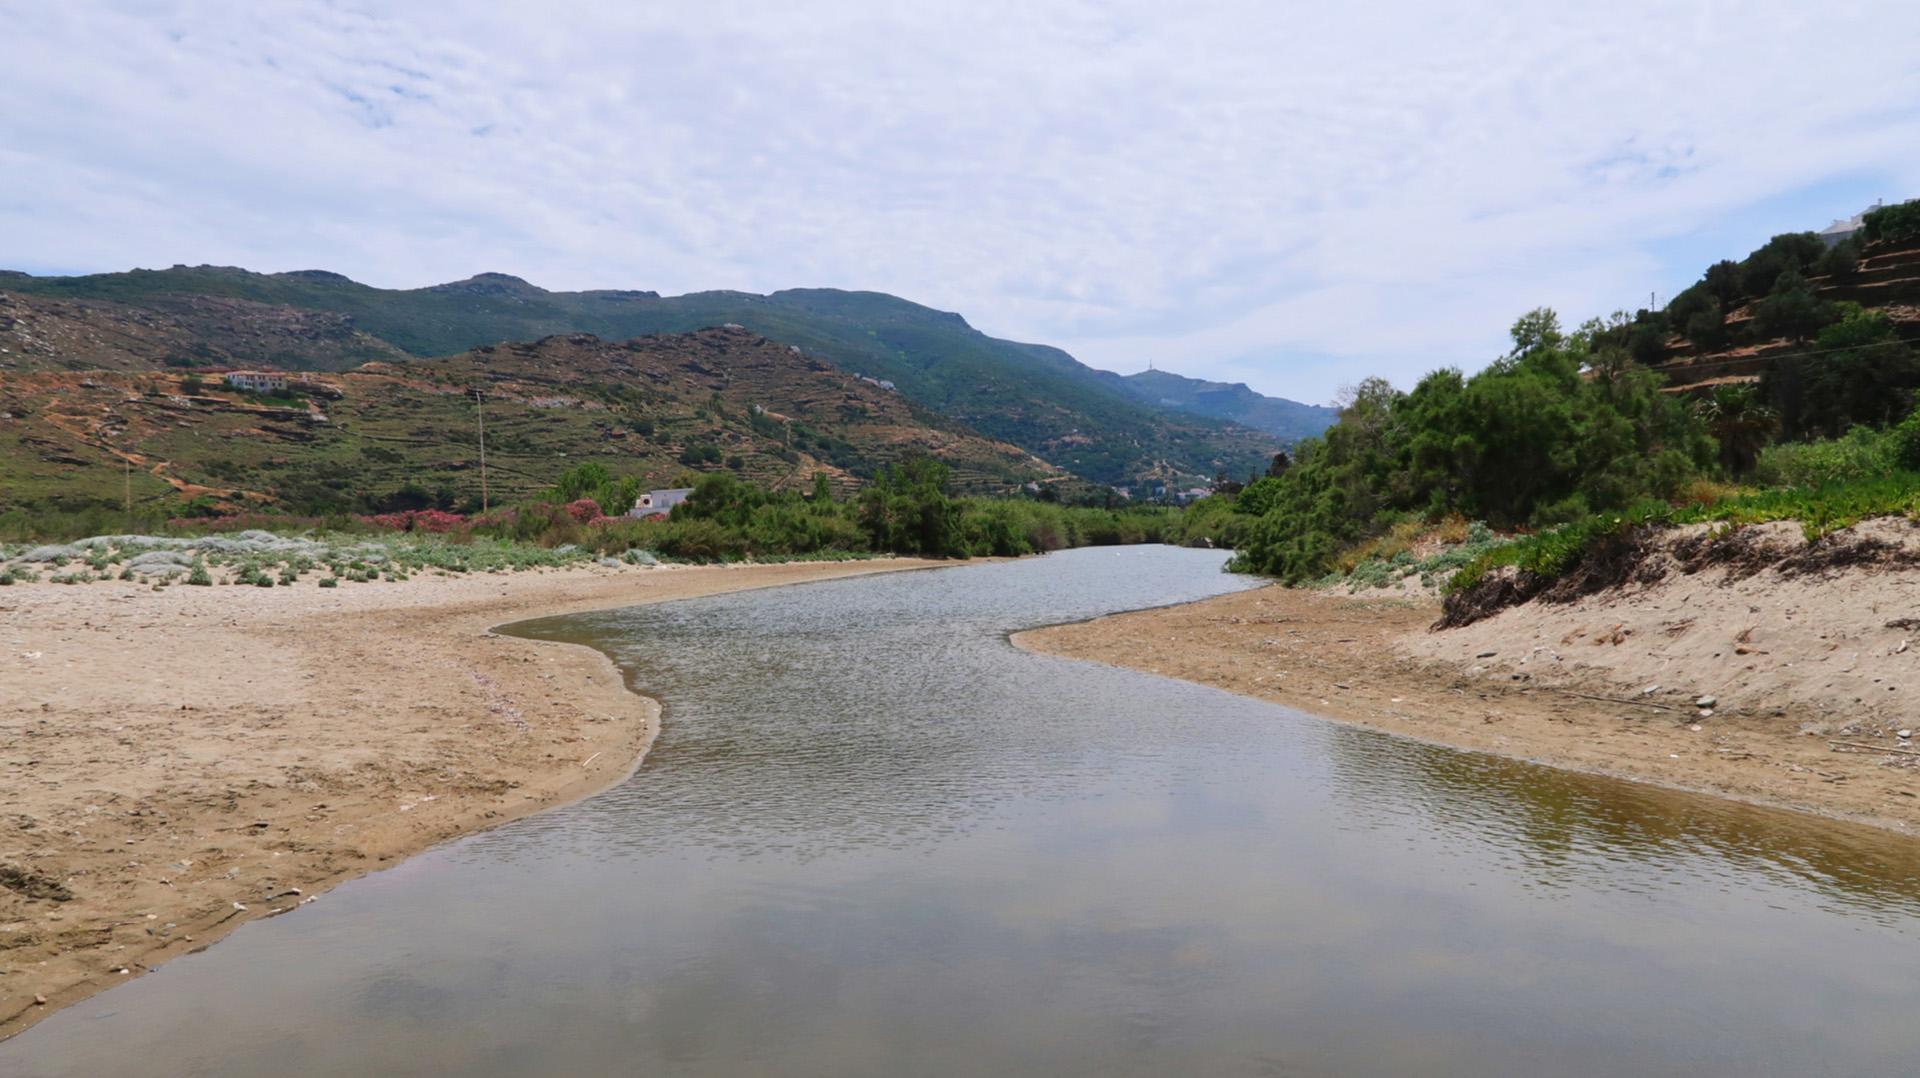 Sway the way andros chora river1